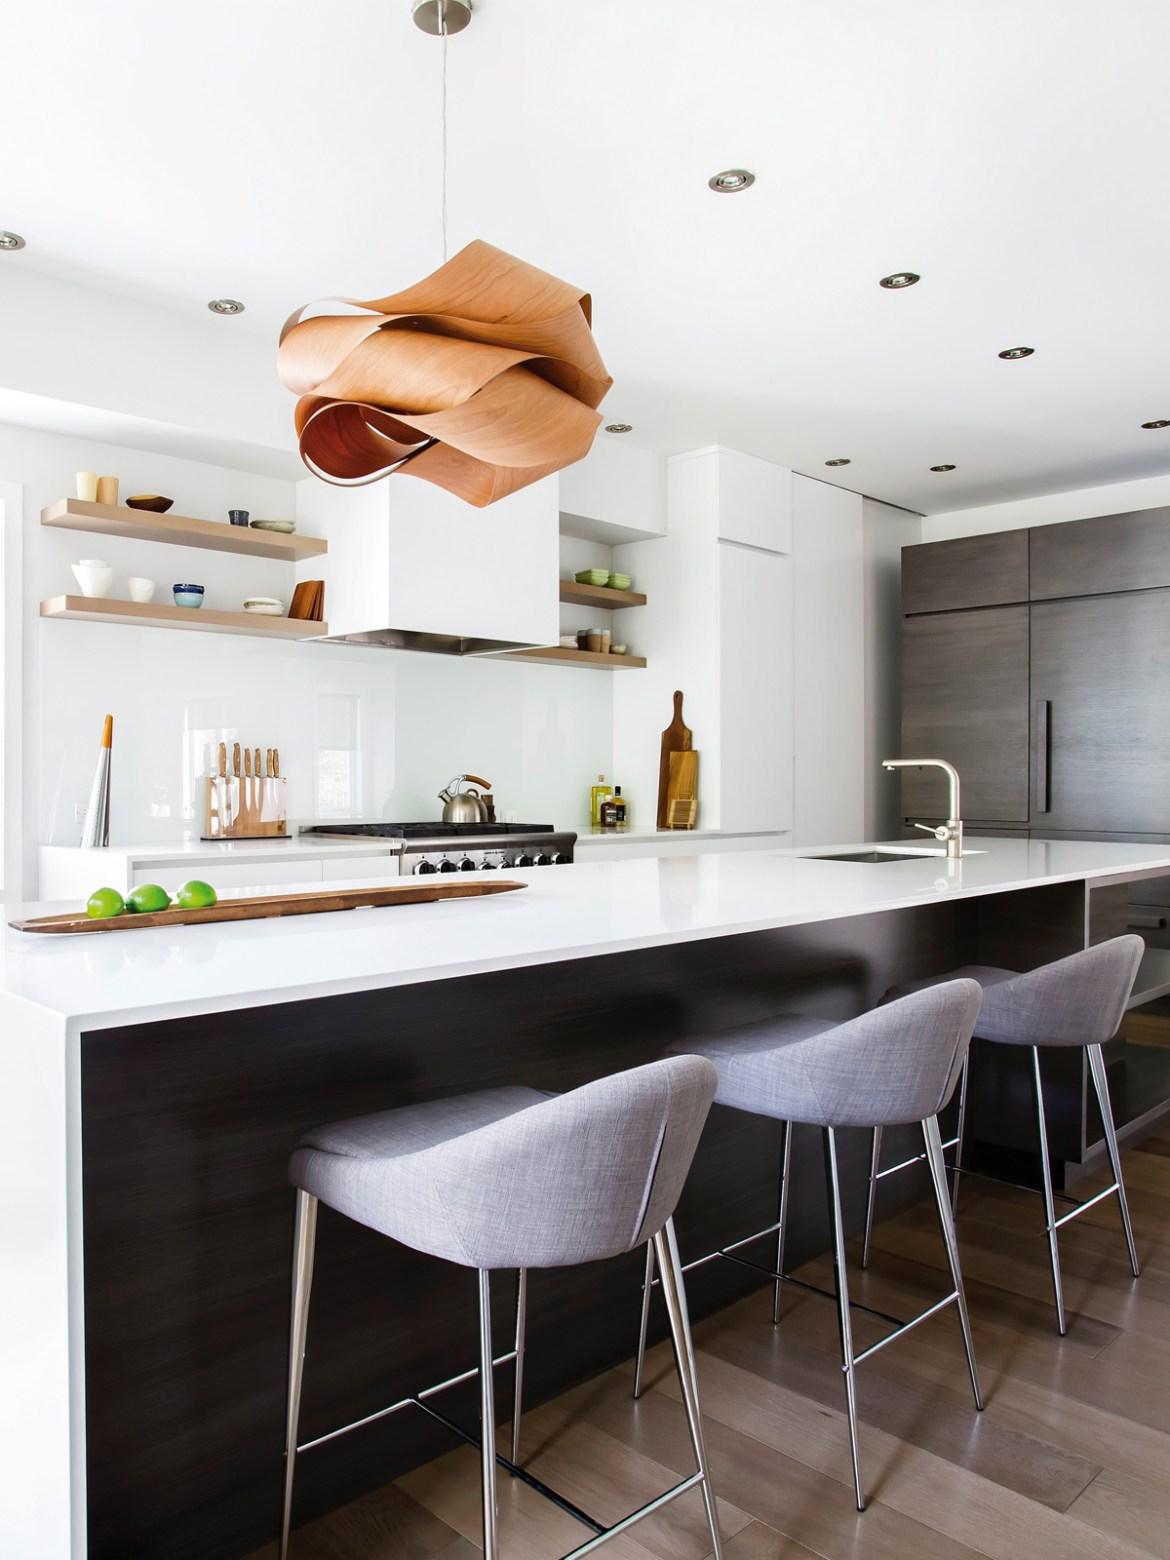 DesignOrt Blog: spanische Designerleuchten LZF Lamps Link